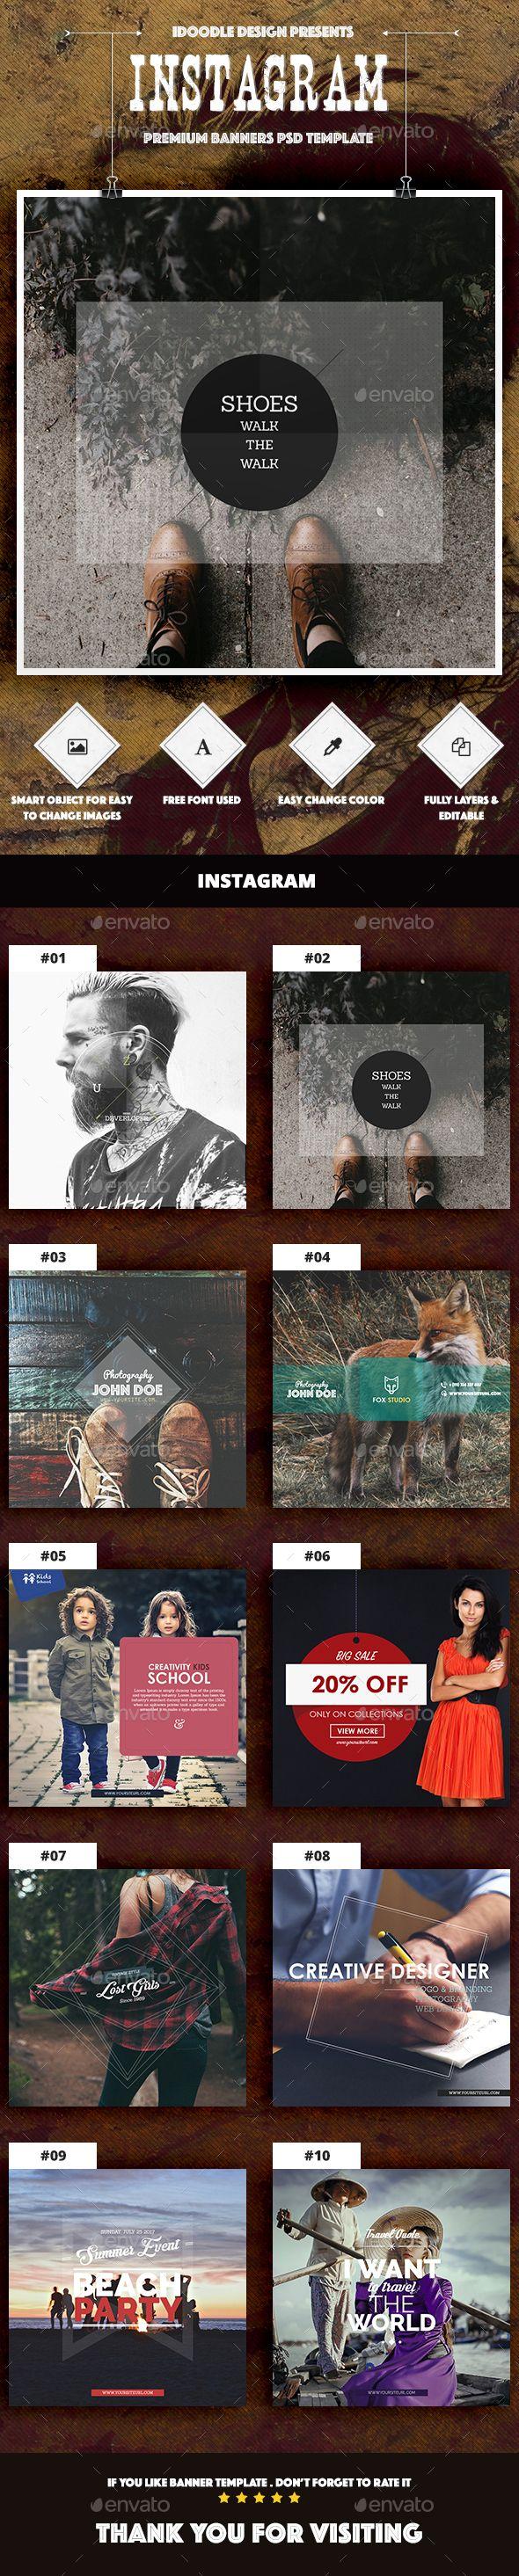 Multipurpose Instagram Ad Template PSD #design Download: http://graphicriver.net/item/multipurpose-instagram-ad/13616367?ref=ksioks